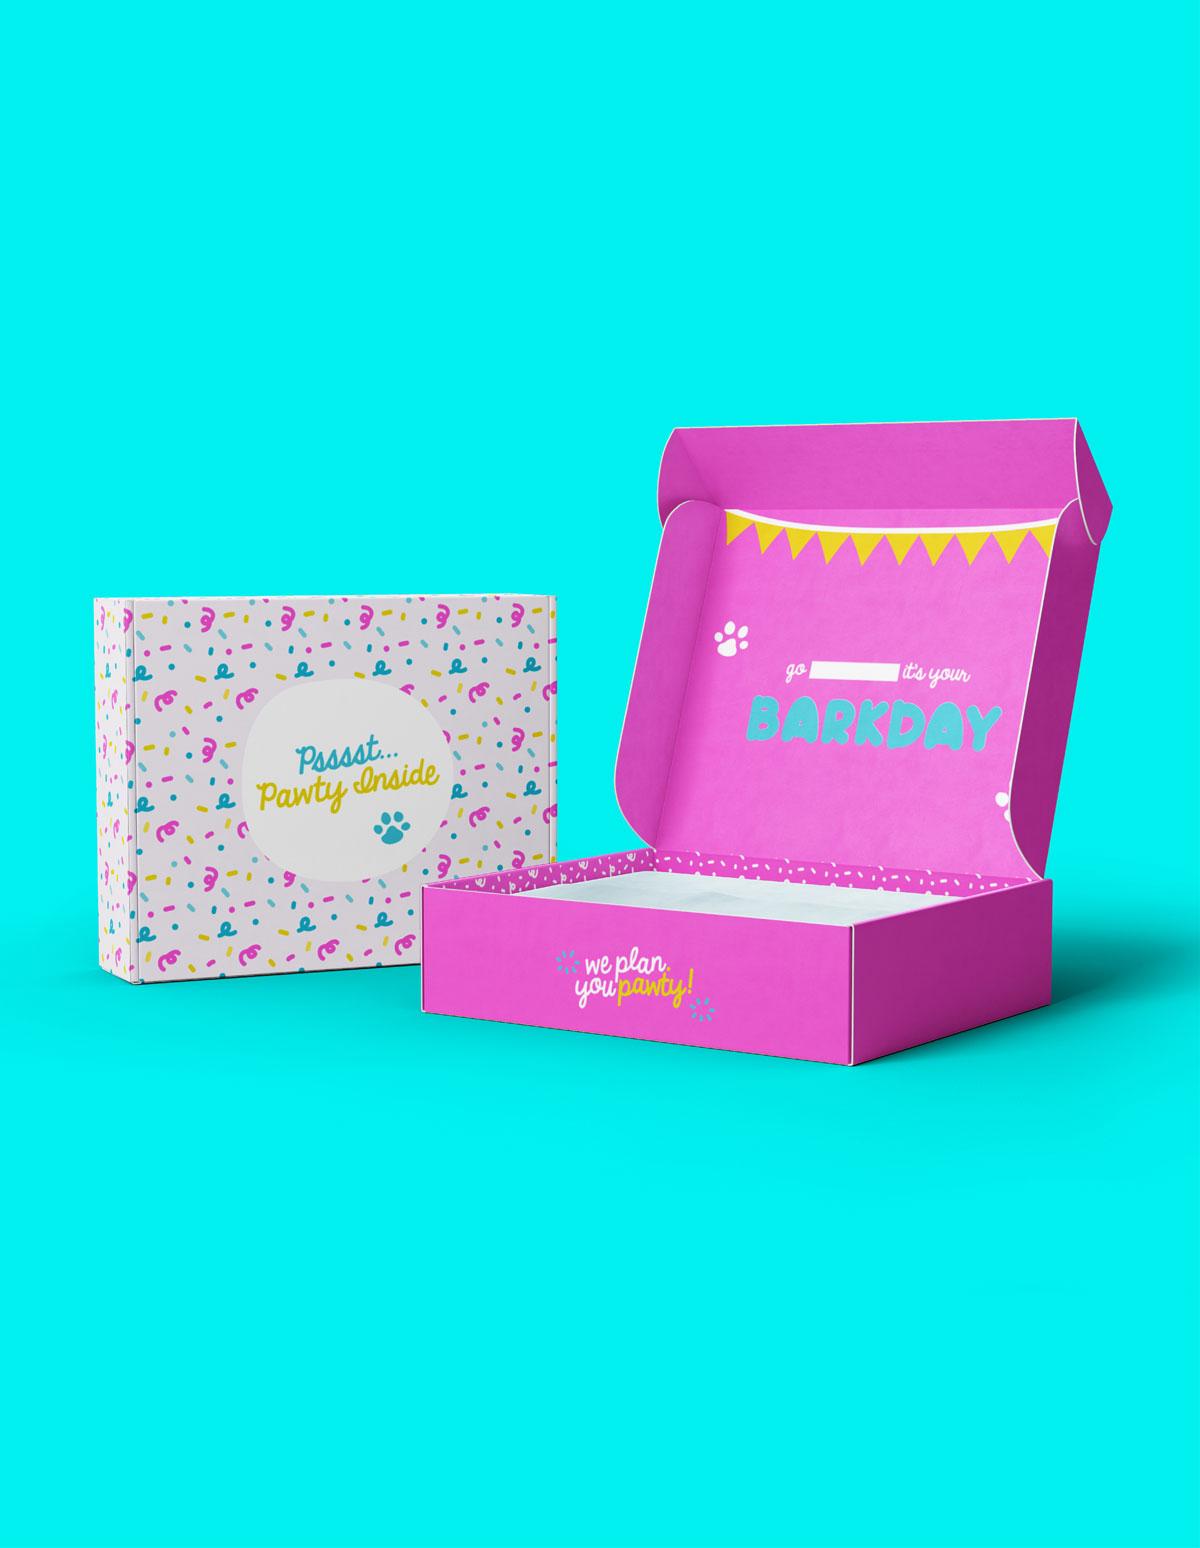 Bark day pink gift box